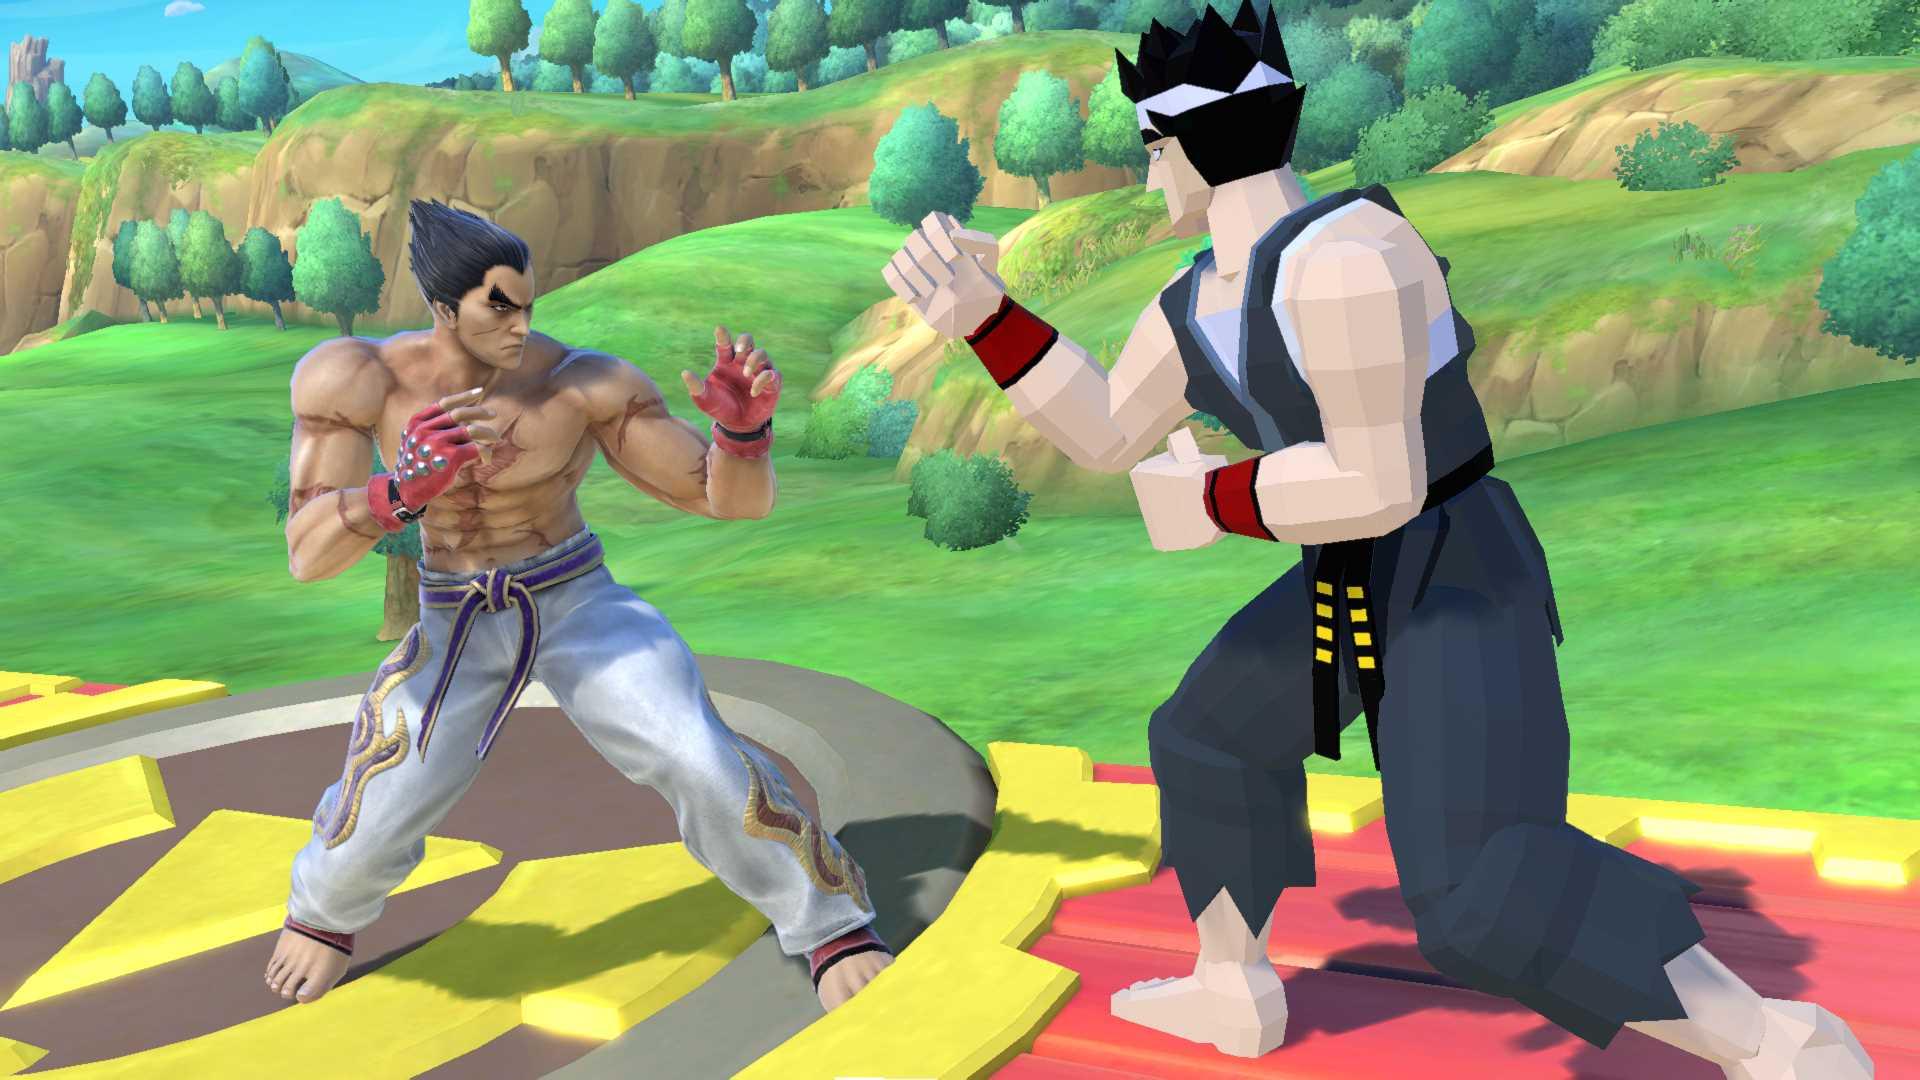 Kazuya Mishima Super Smash Bros. Ultimate - Heute gegen damals